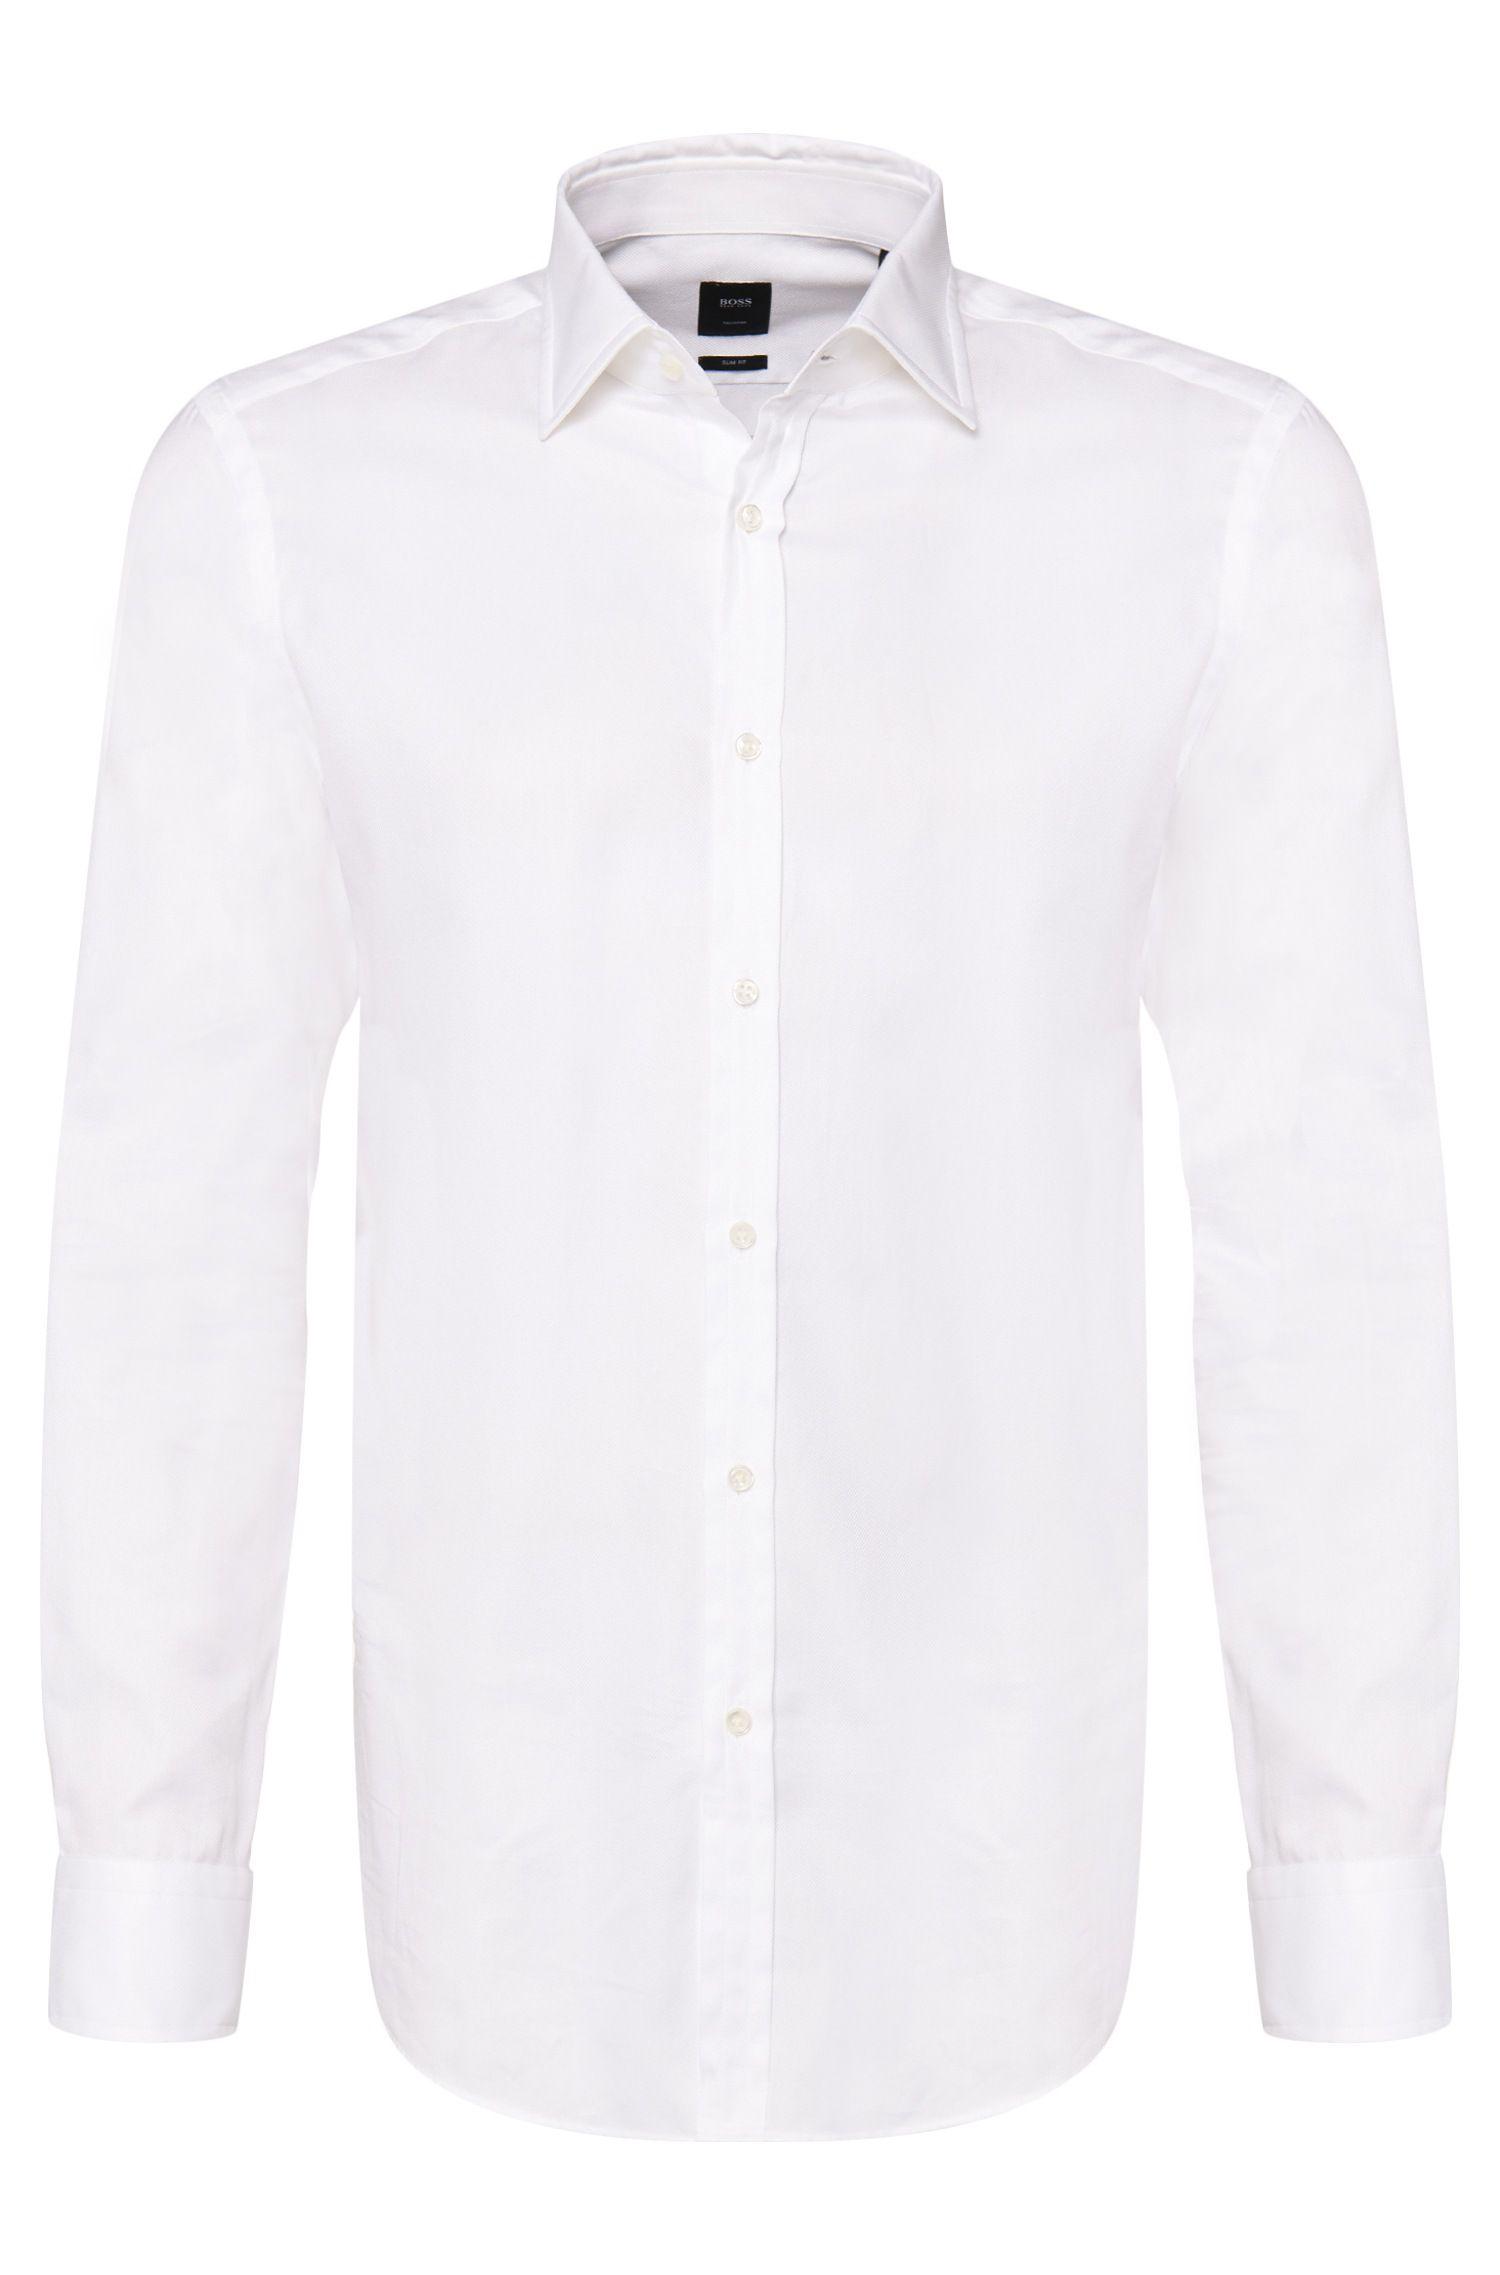 'T-Shane'   Slim Fit, Italian Cotton Dress Shirt